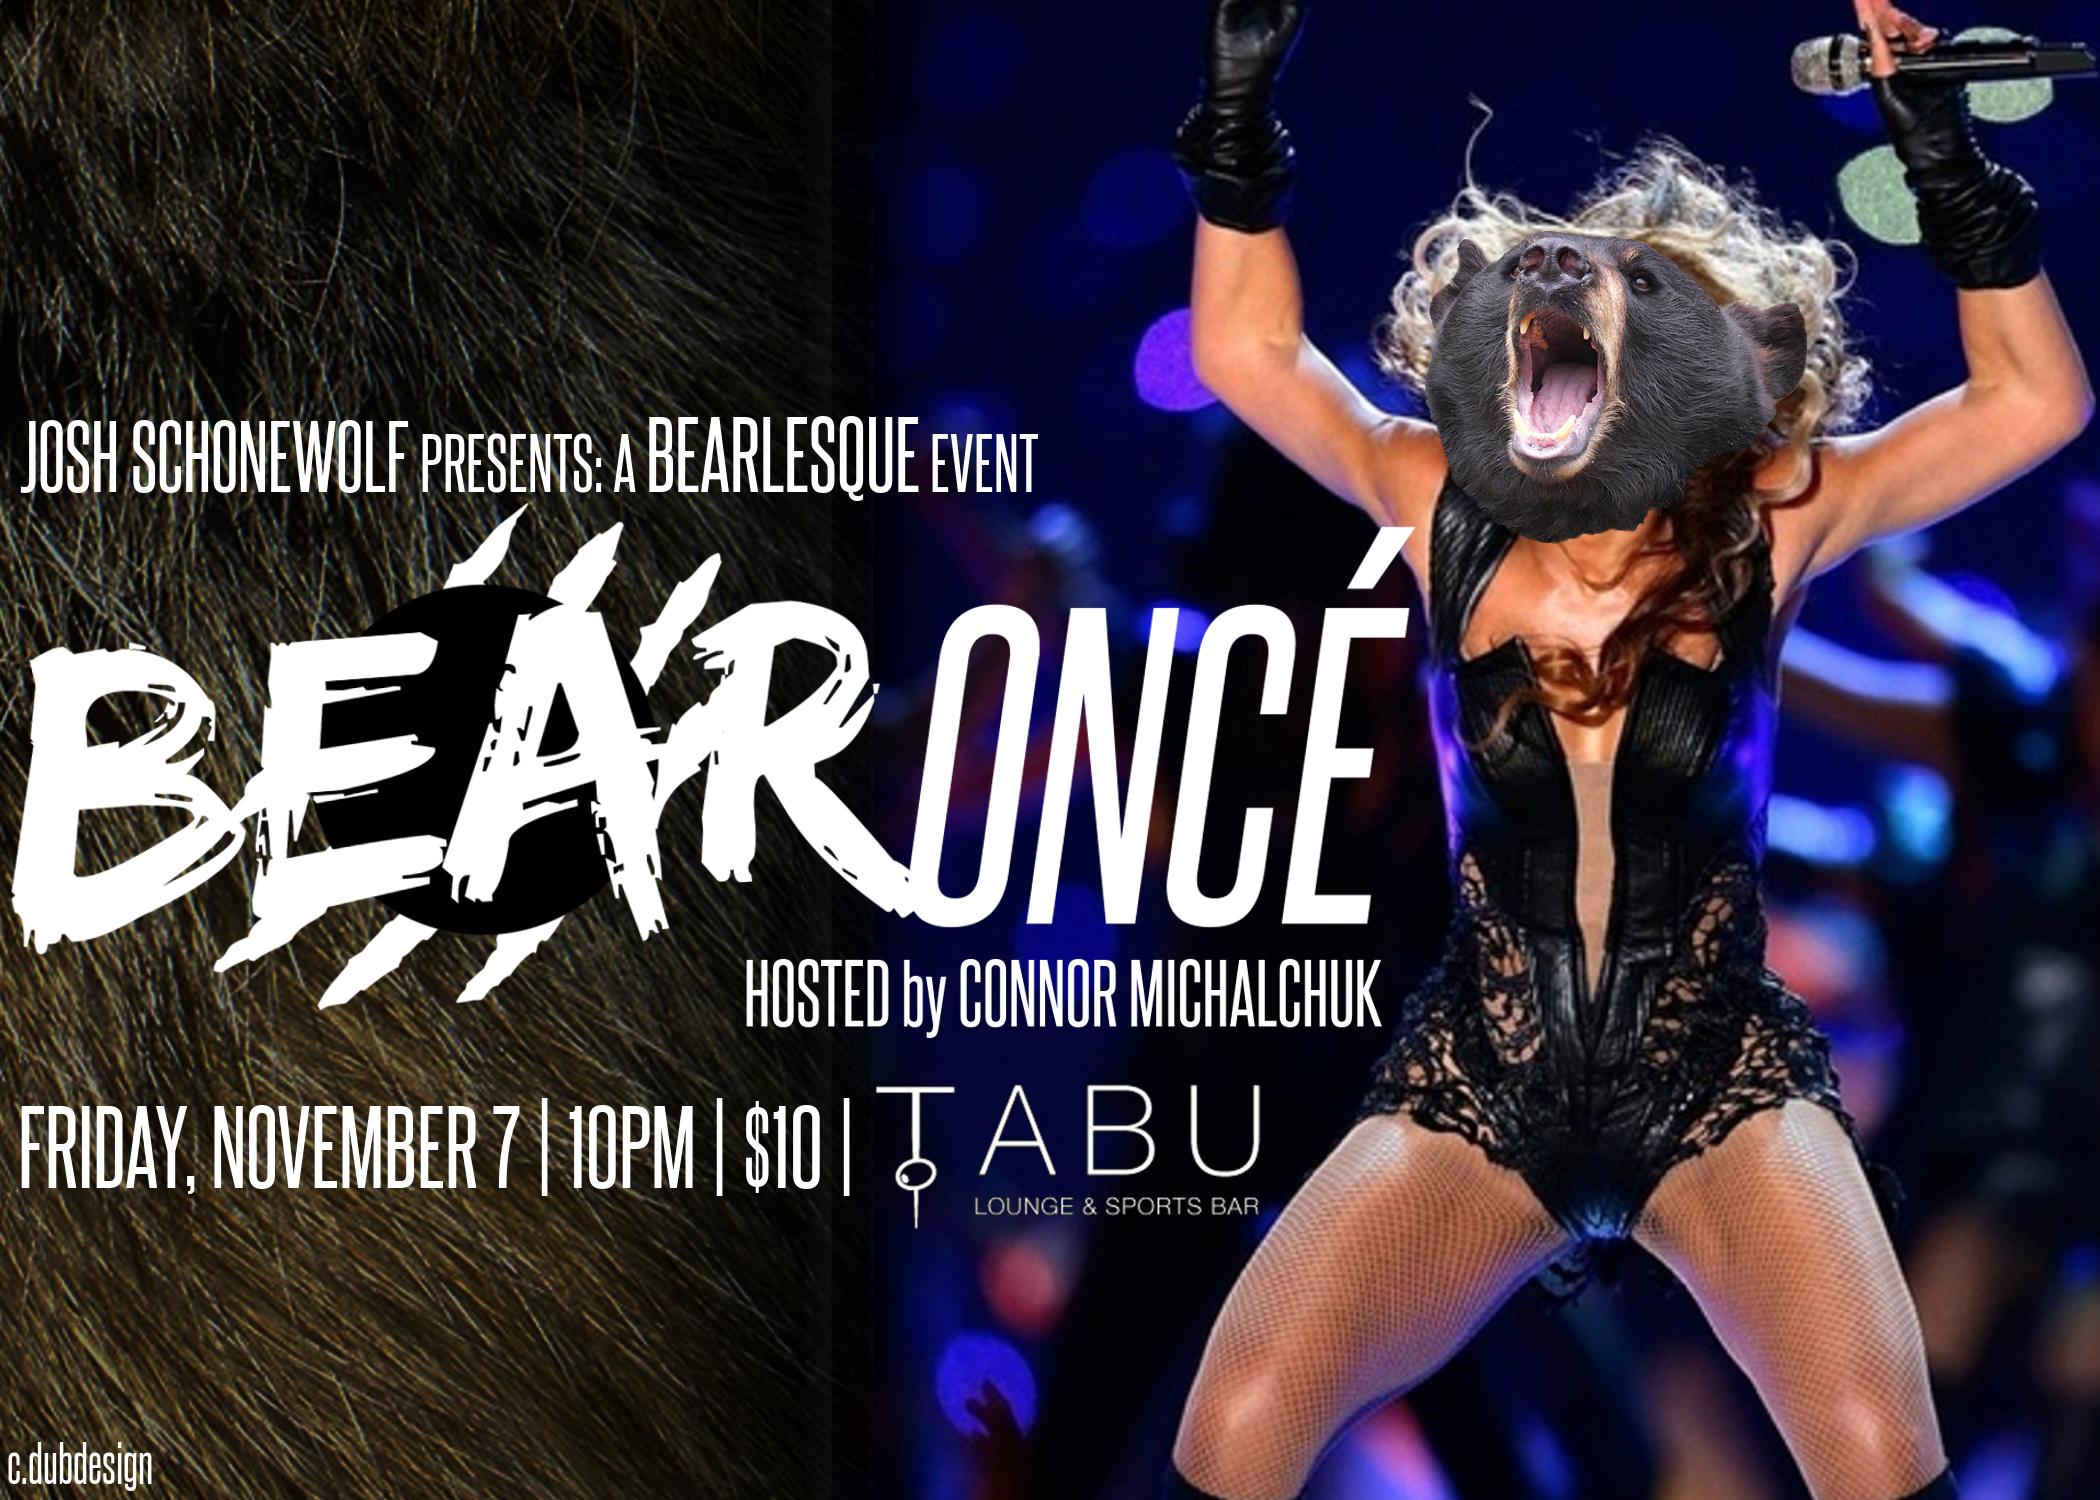 A Bearlesque Event: BEARONCE